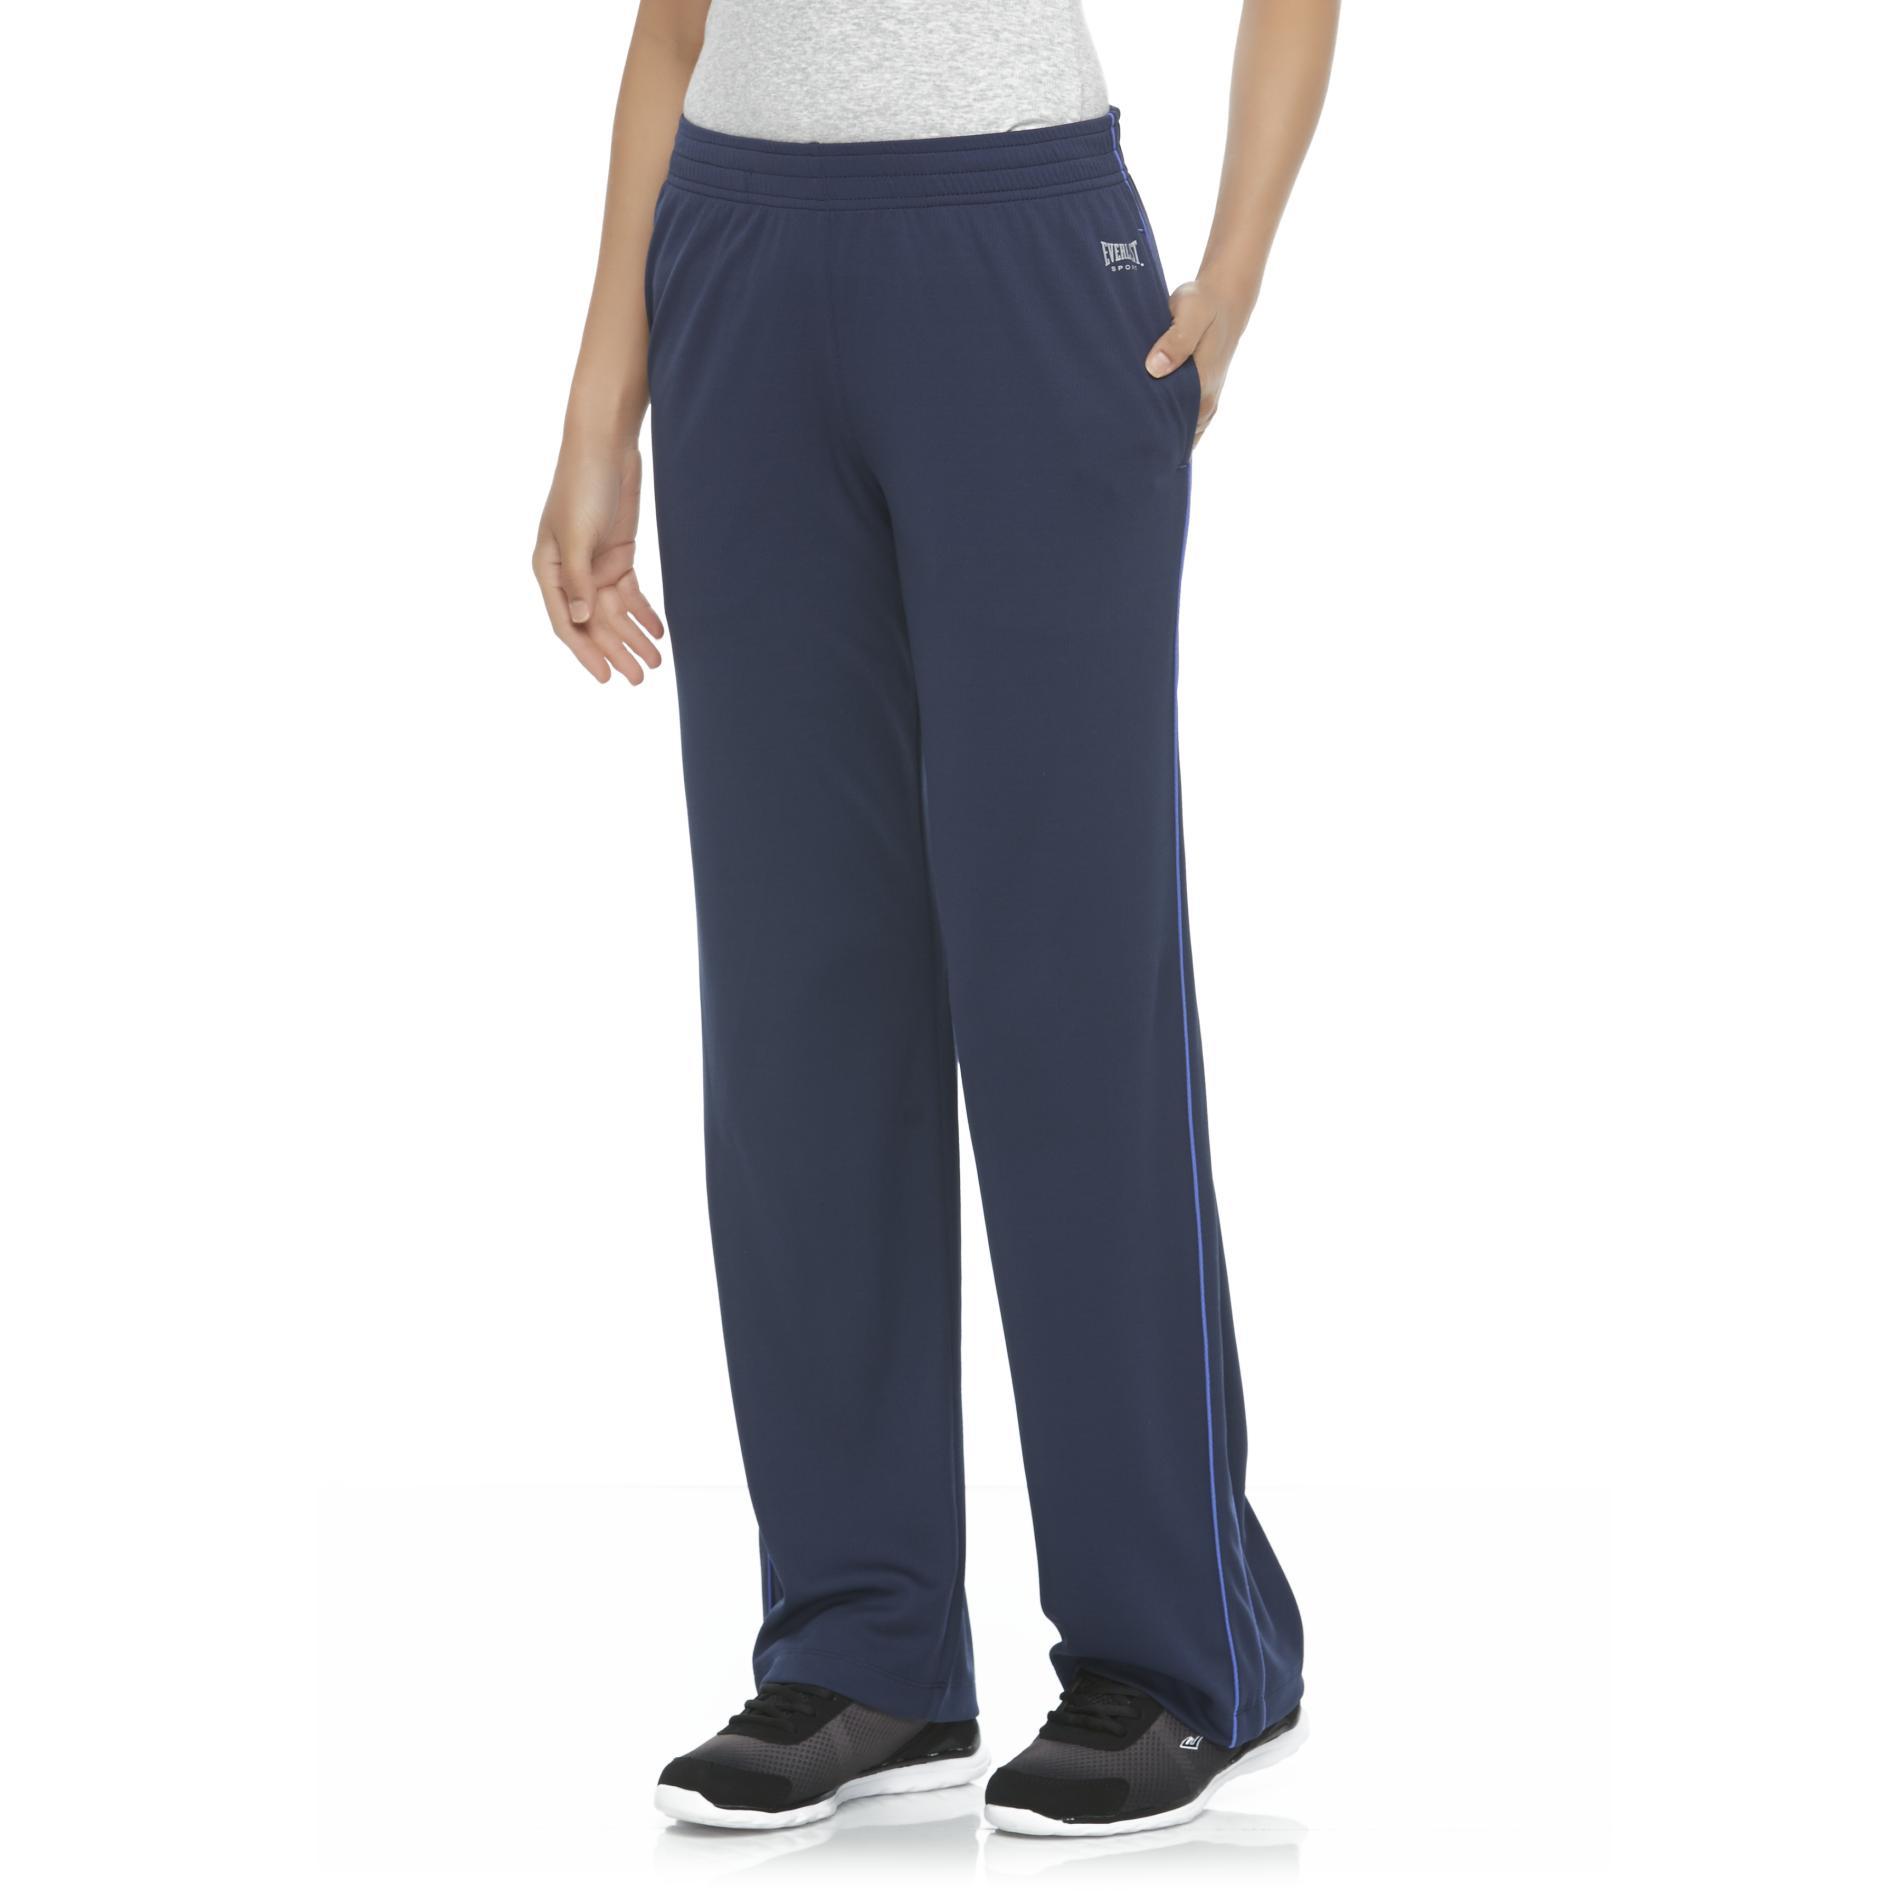 Everlast® Sport Women's Mesh Knit Running Pants at Kmart.com